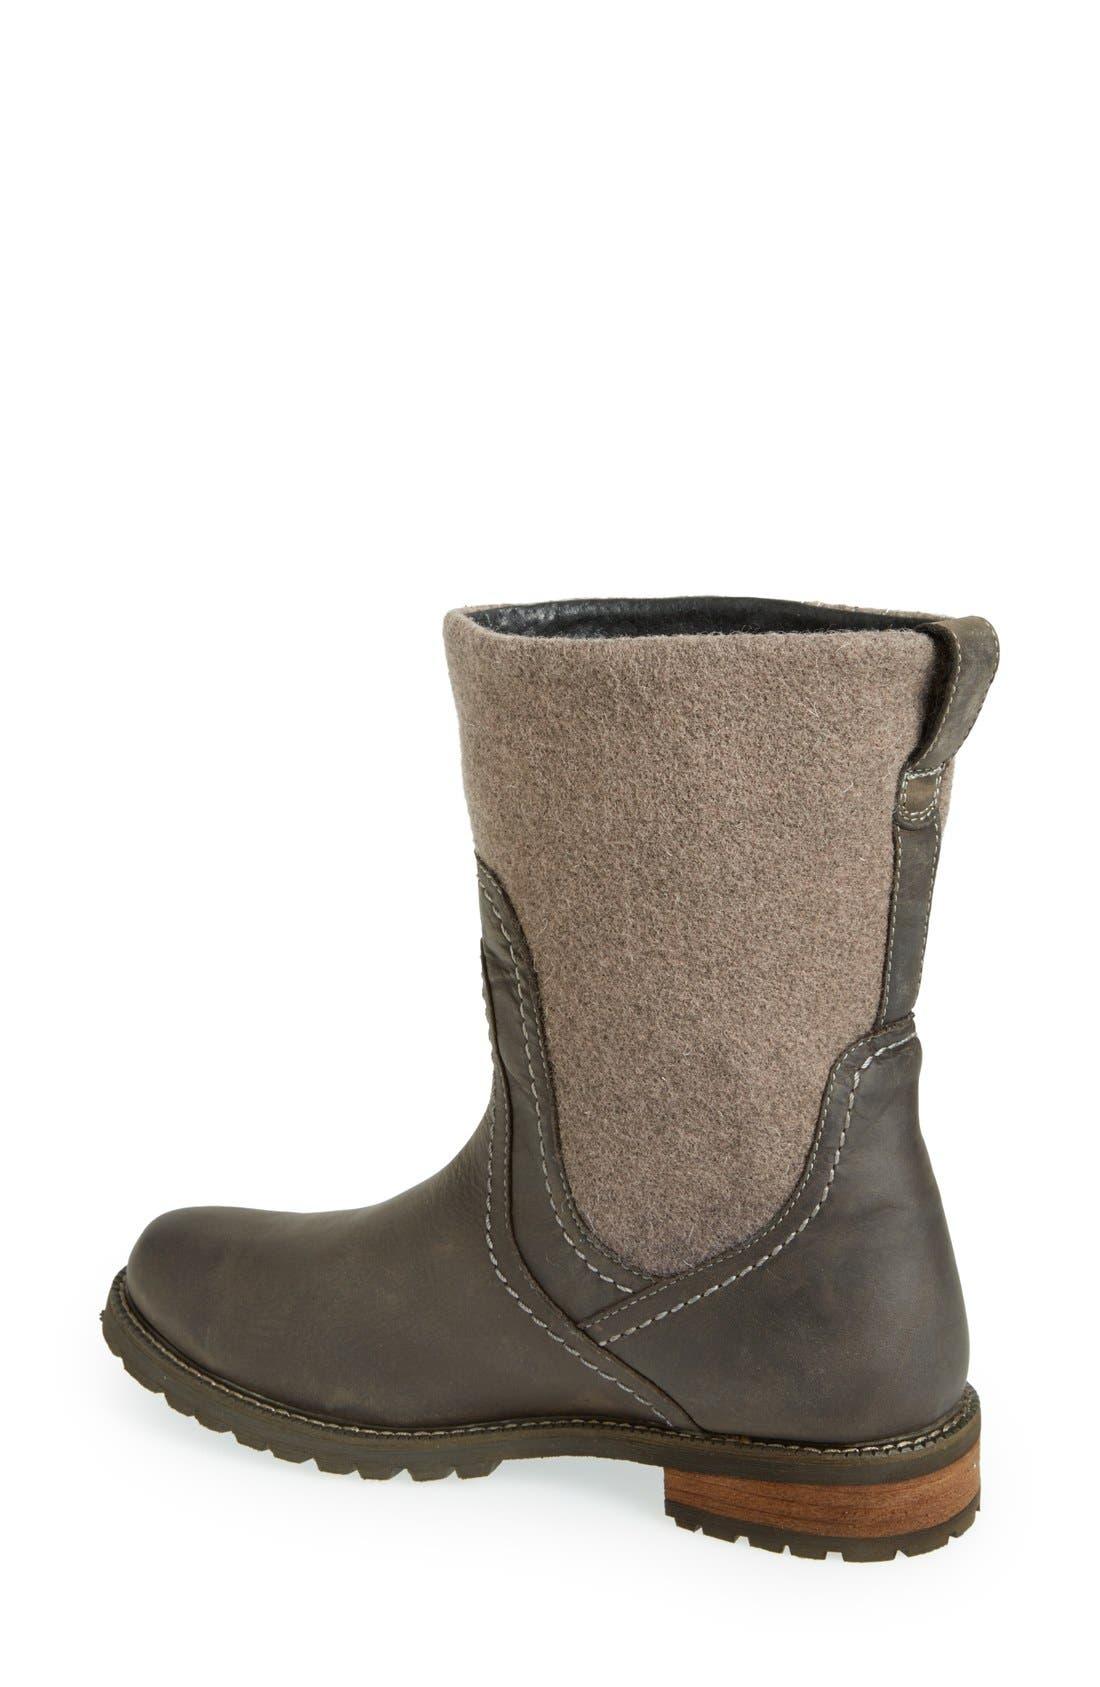 Alternate Image 2  - Ariat 'Shannon H20' Waterproof Boot (Women)